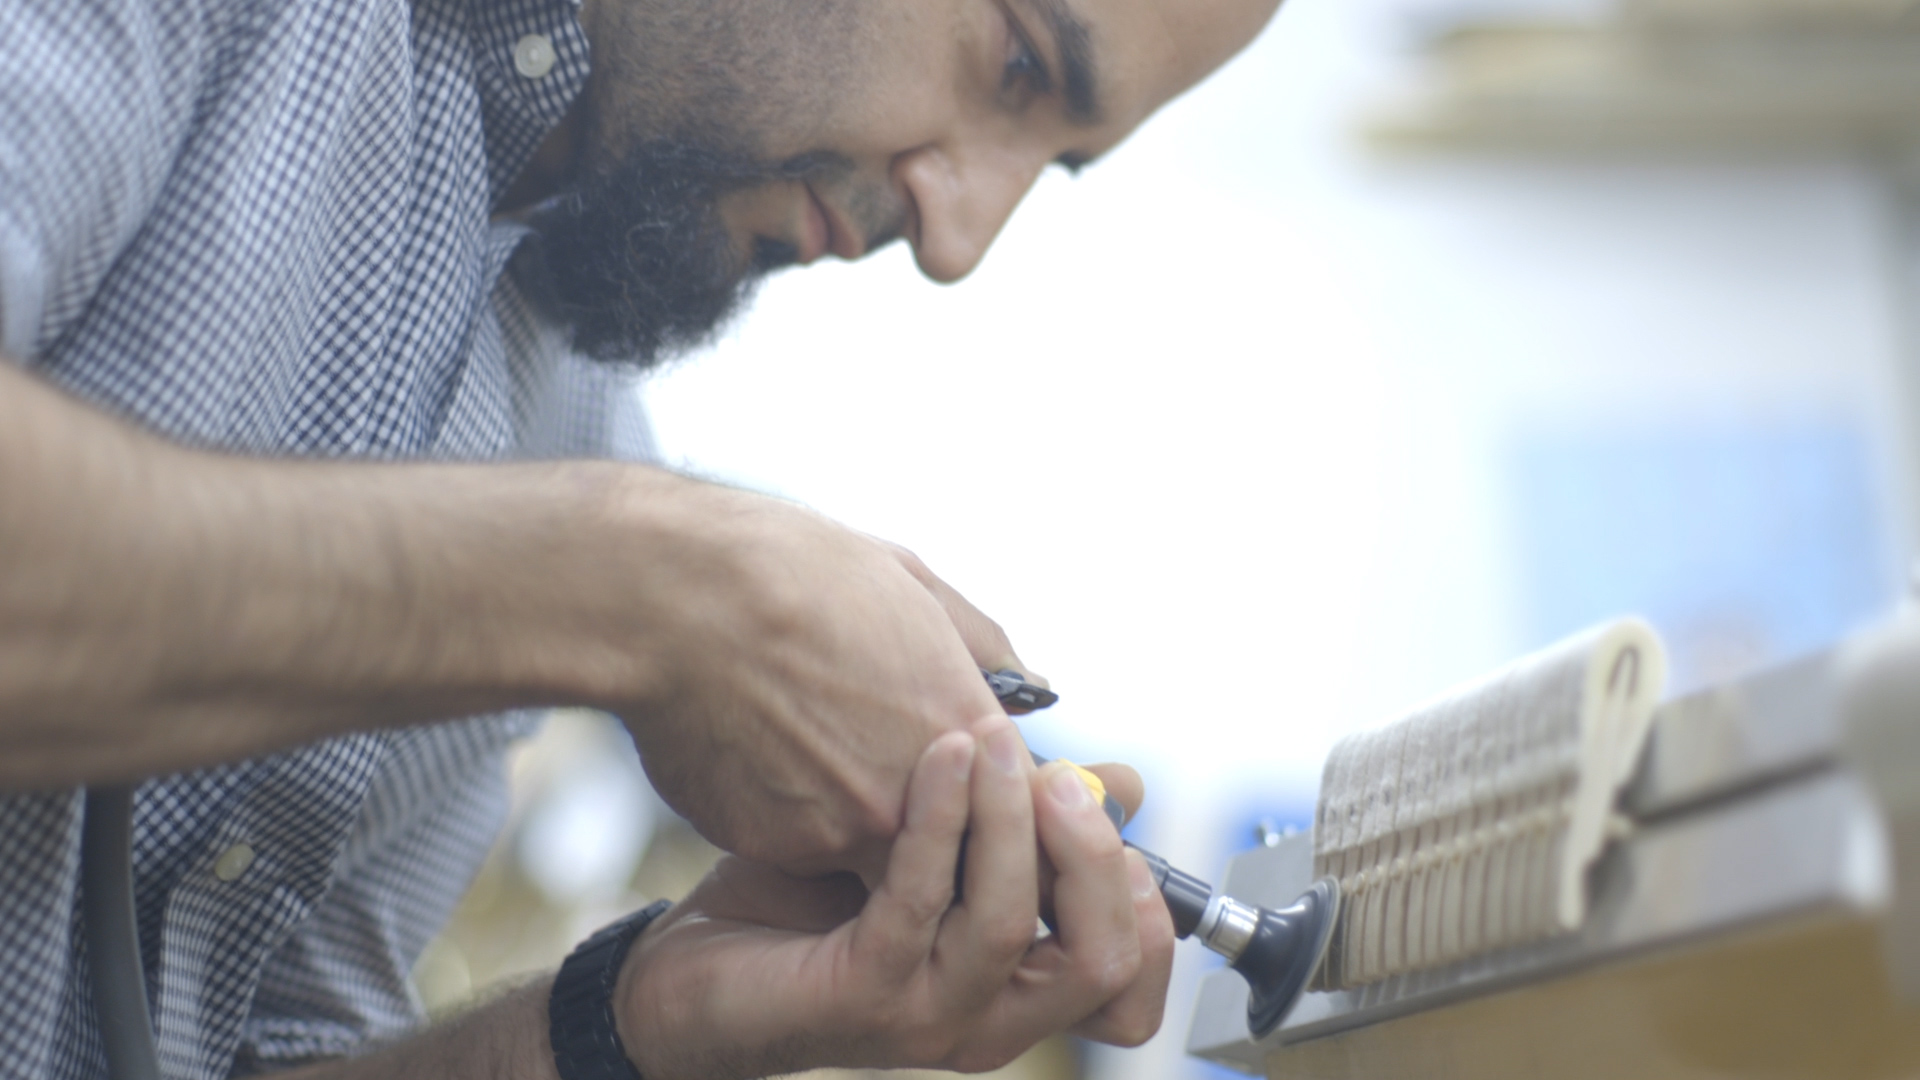 Neema Pazargad uses a power tool while repairing piano parts